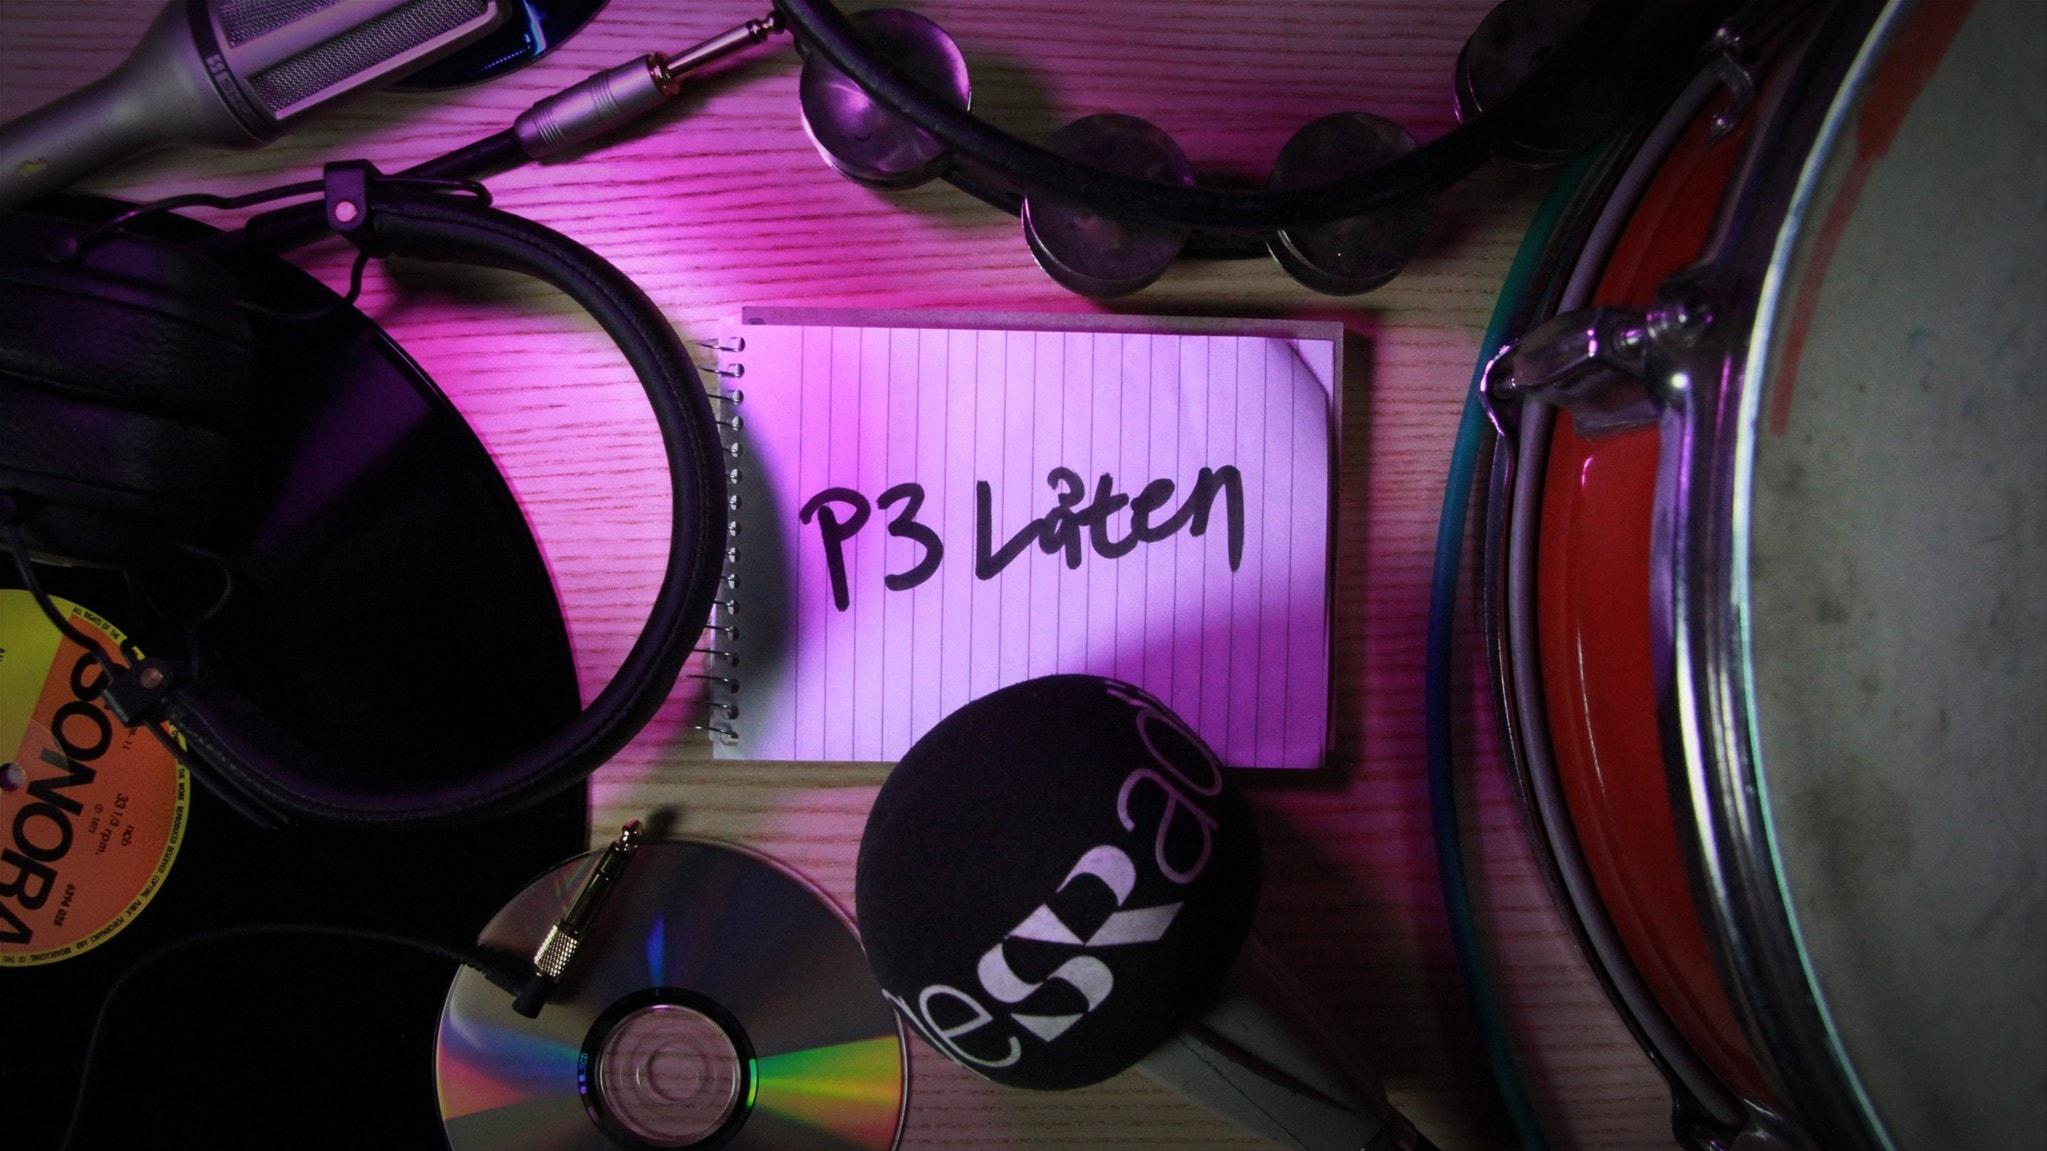 PODDTIPS: P3 Låten